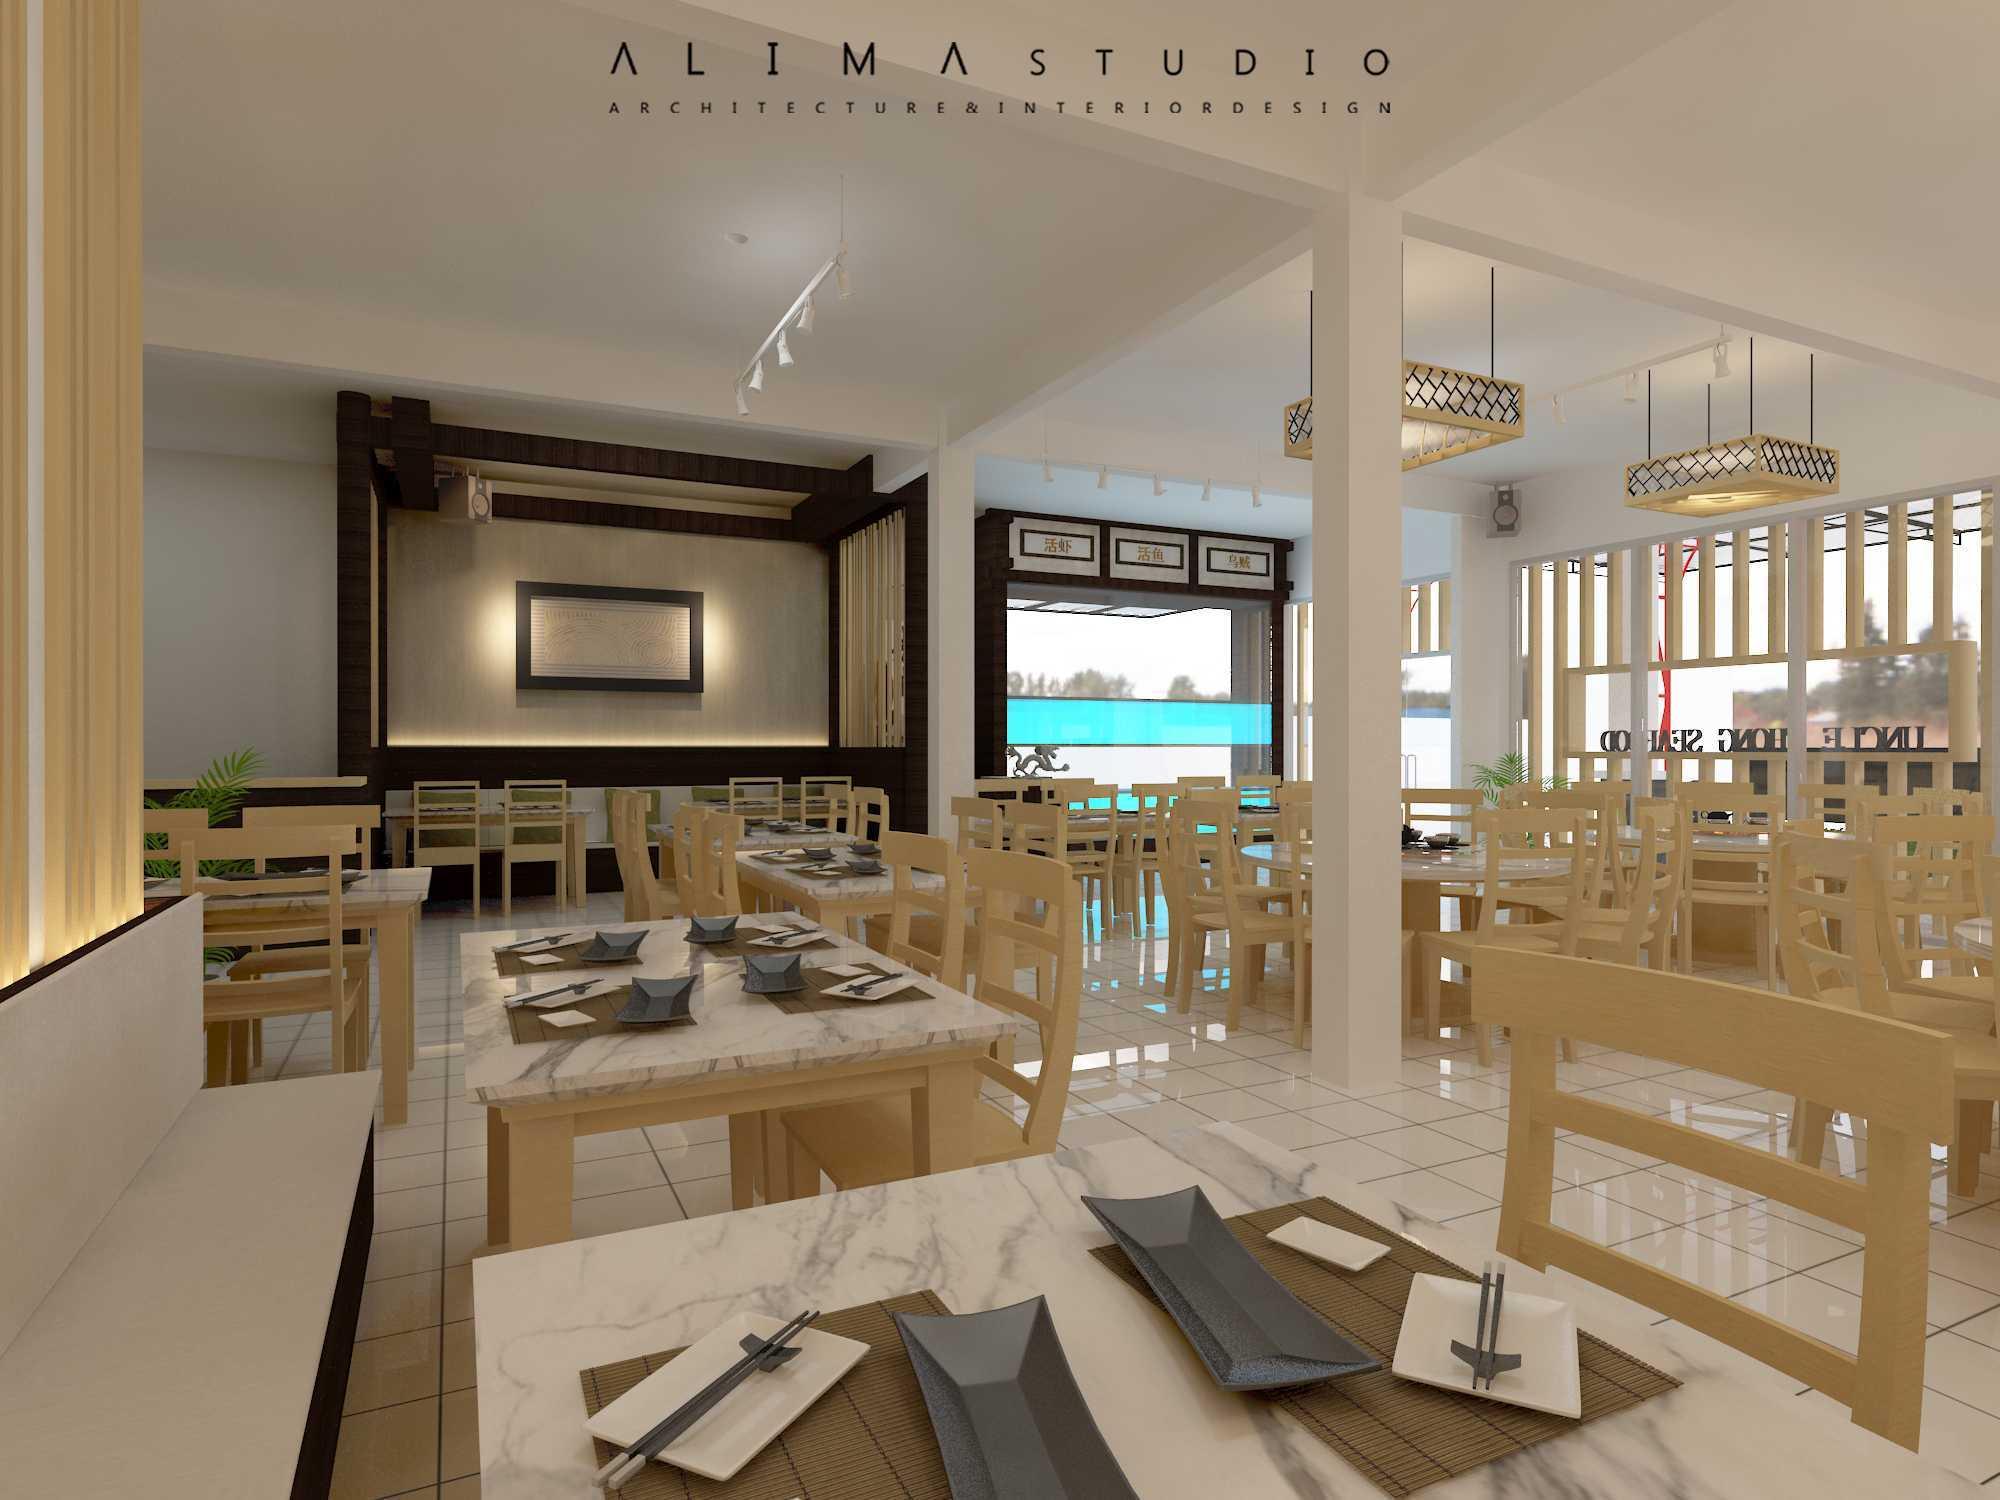 Alima Studio Uncle Chong Restaurant Jl. By Pass Ngurah Rai No.402, Sanur, Denpasar Sel., Bali, 80228, Indonesia Jl. By Pass Ngurah Rai No.402, Sanur, Denpasar Sel., Bali, 80228, Indonesia Alima-Studio-Uncle-Chong-Restaurant  61864